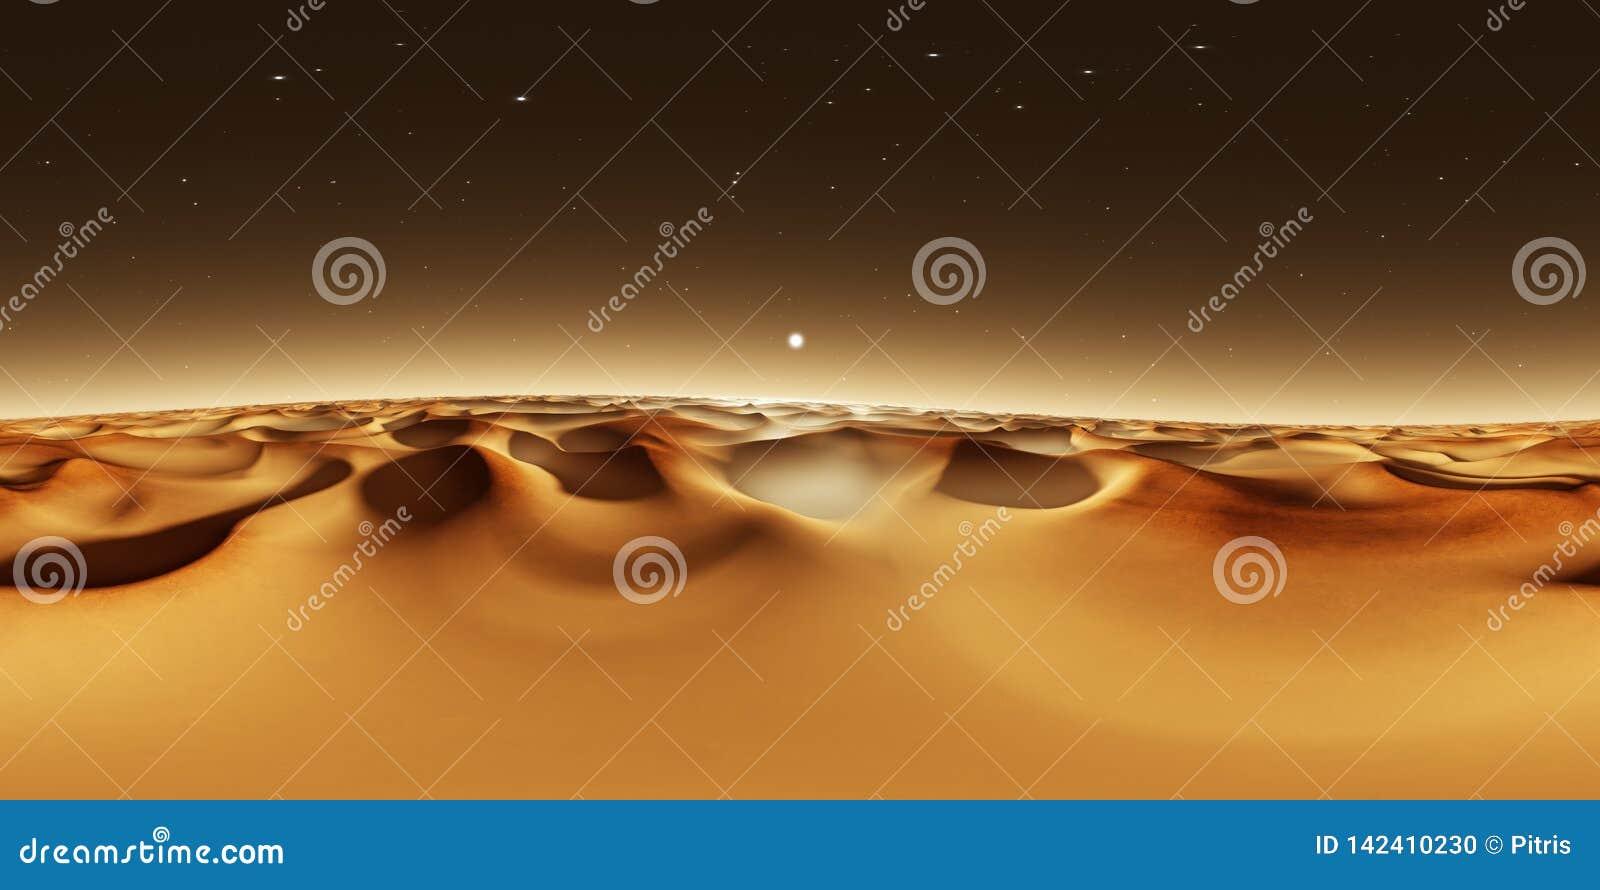 панорама 360 градусов захода солнца на Марсе, песчанных дюнах Марса, карте окружающей среды 360 HDRI Проекция Equirectangular, сф